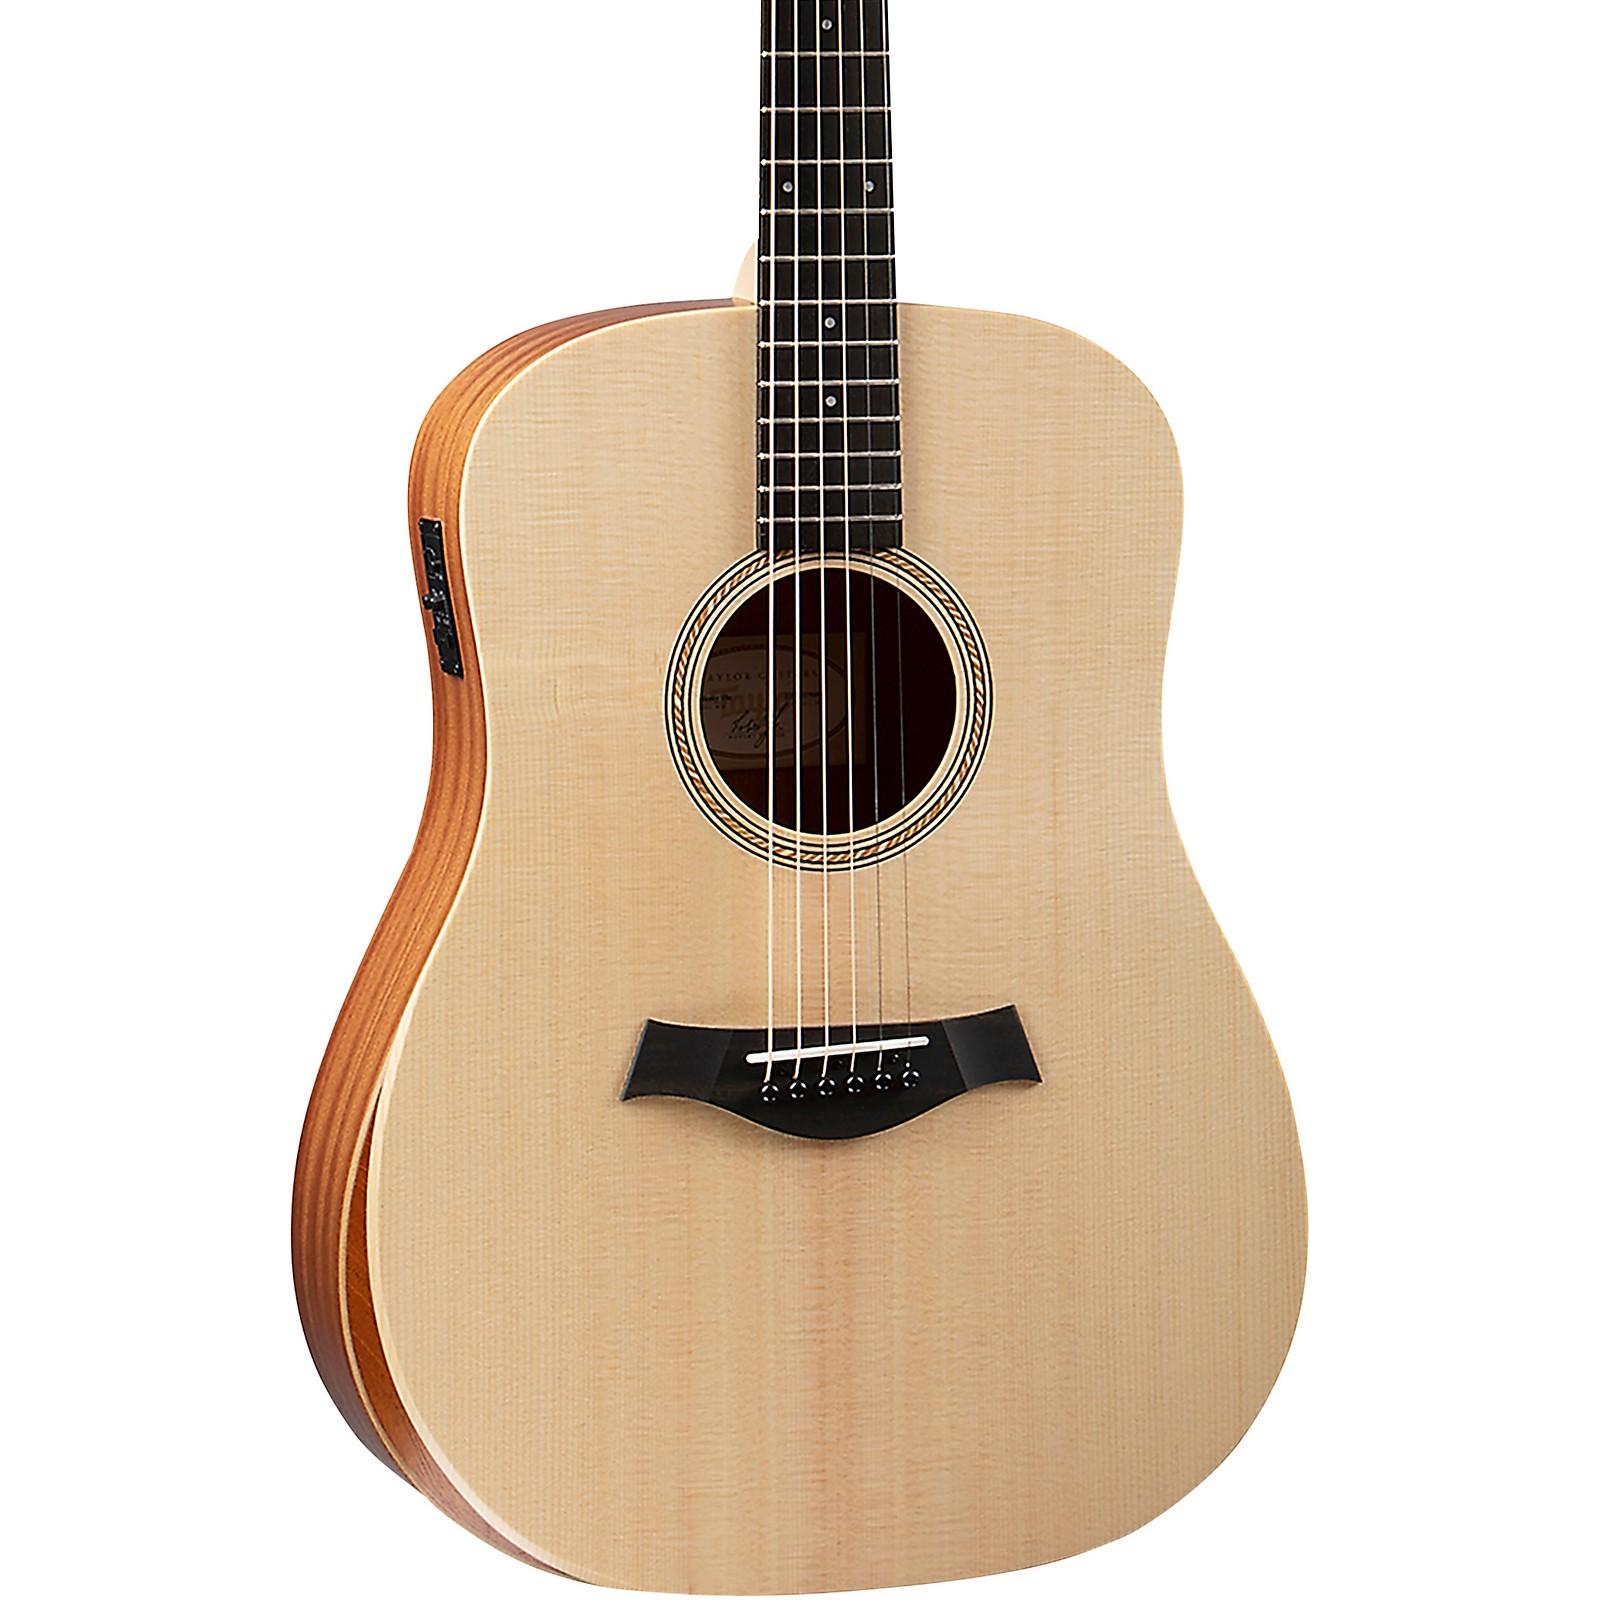 Taylor Academy 10e Acoustic-Electric Guitar